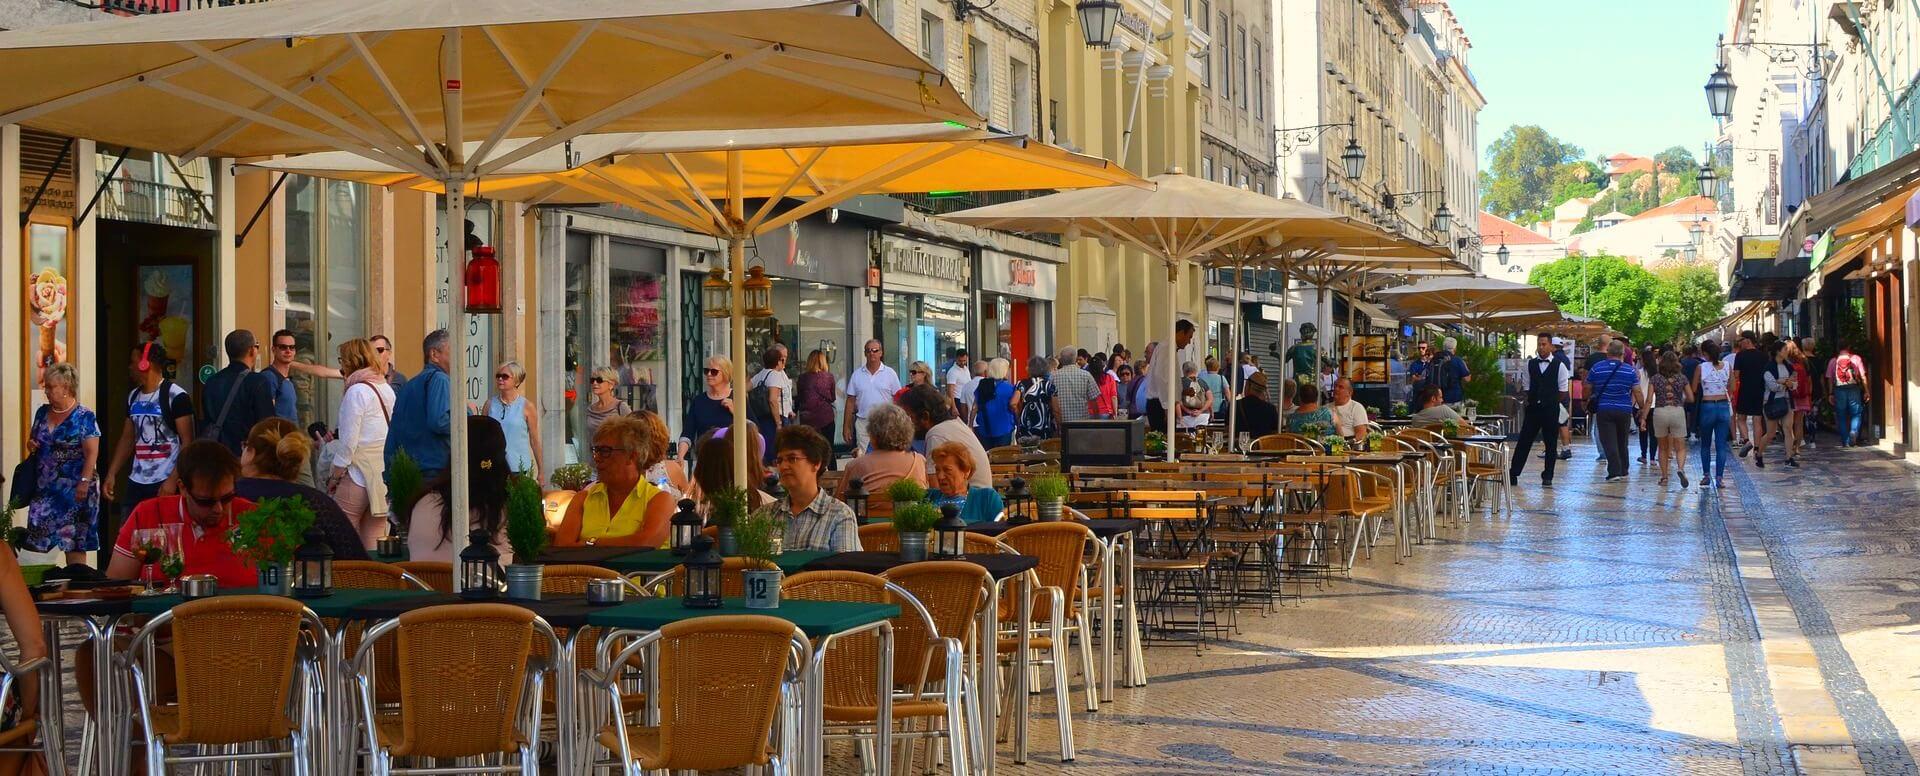 Restaurants in Lisbon - Lisbon